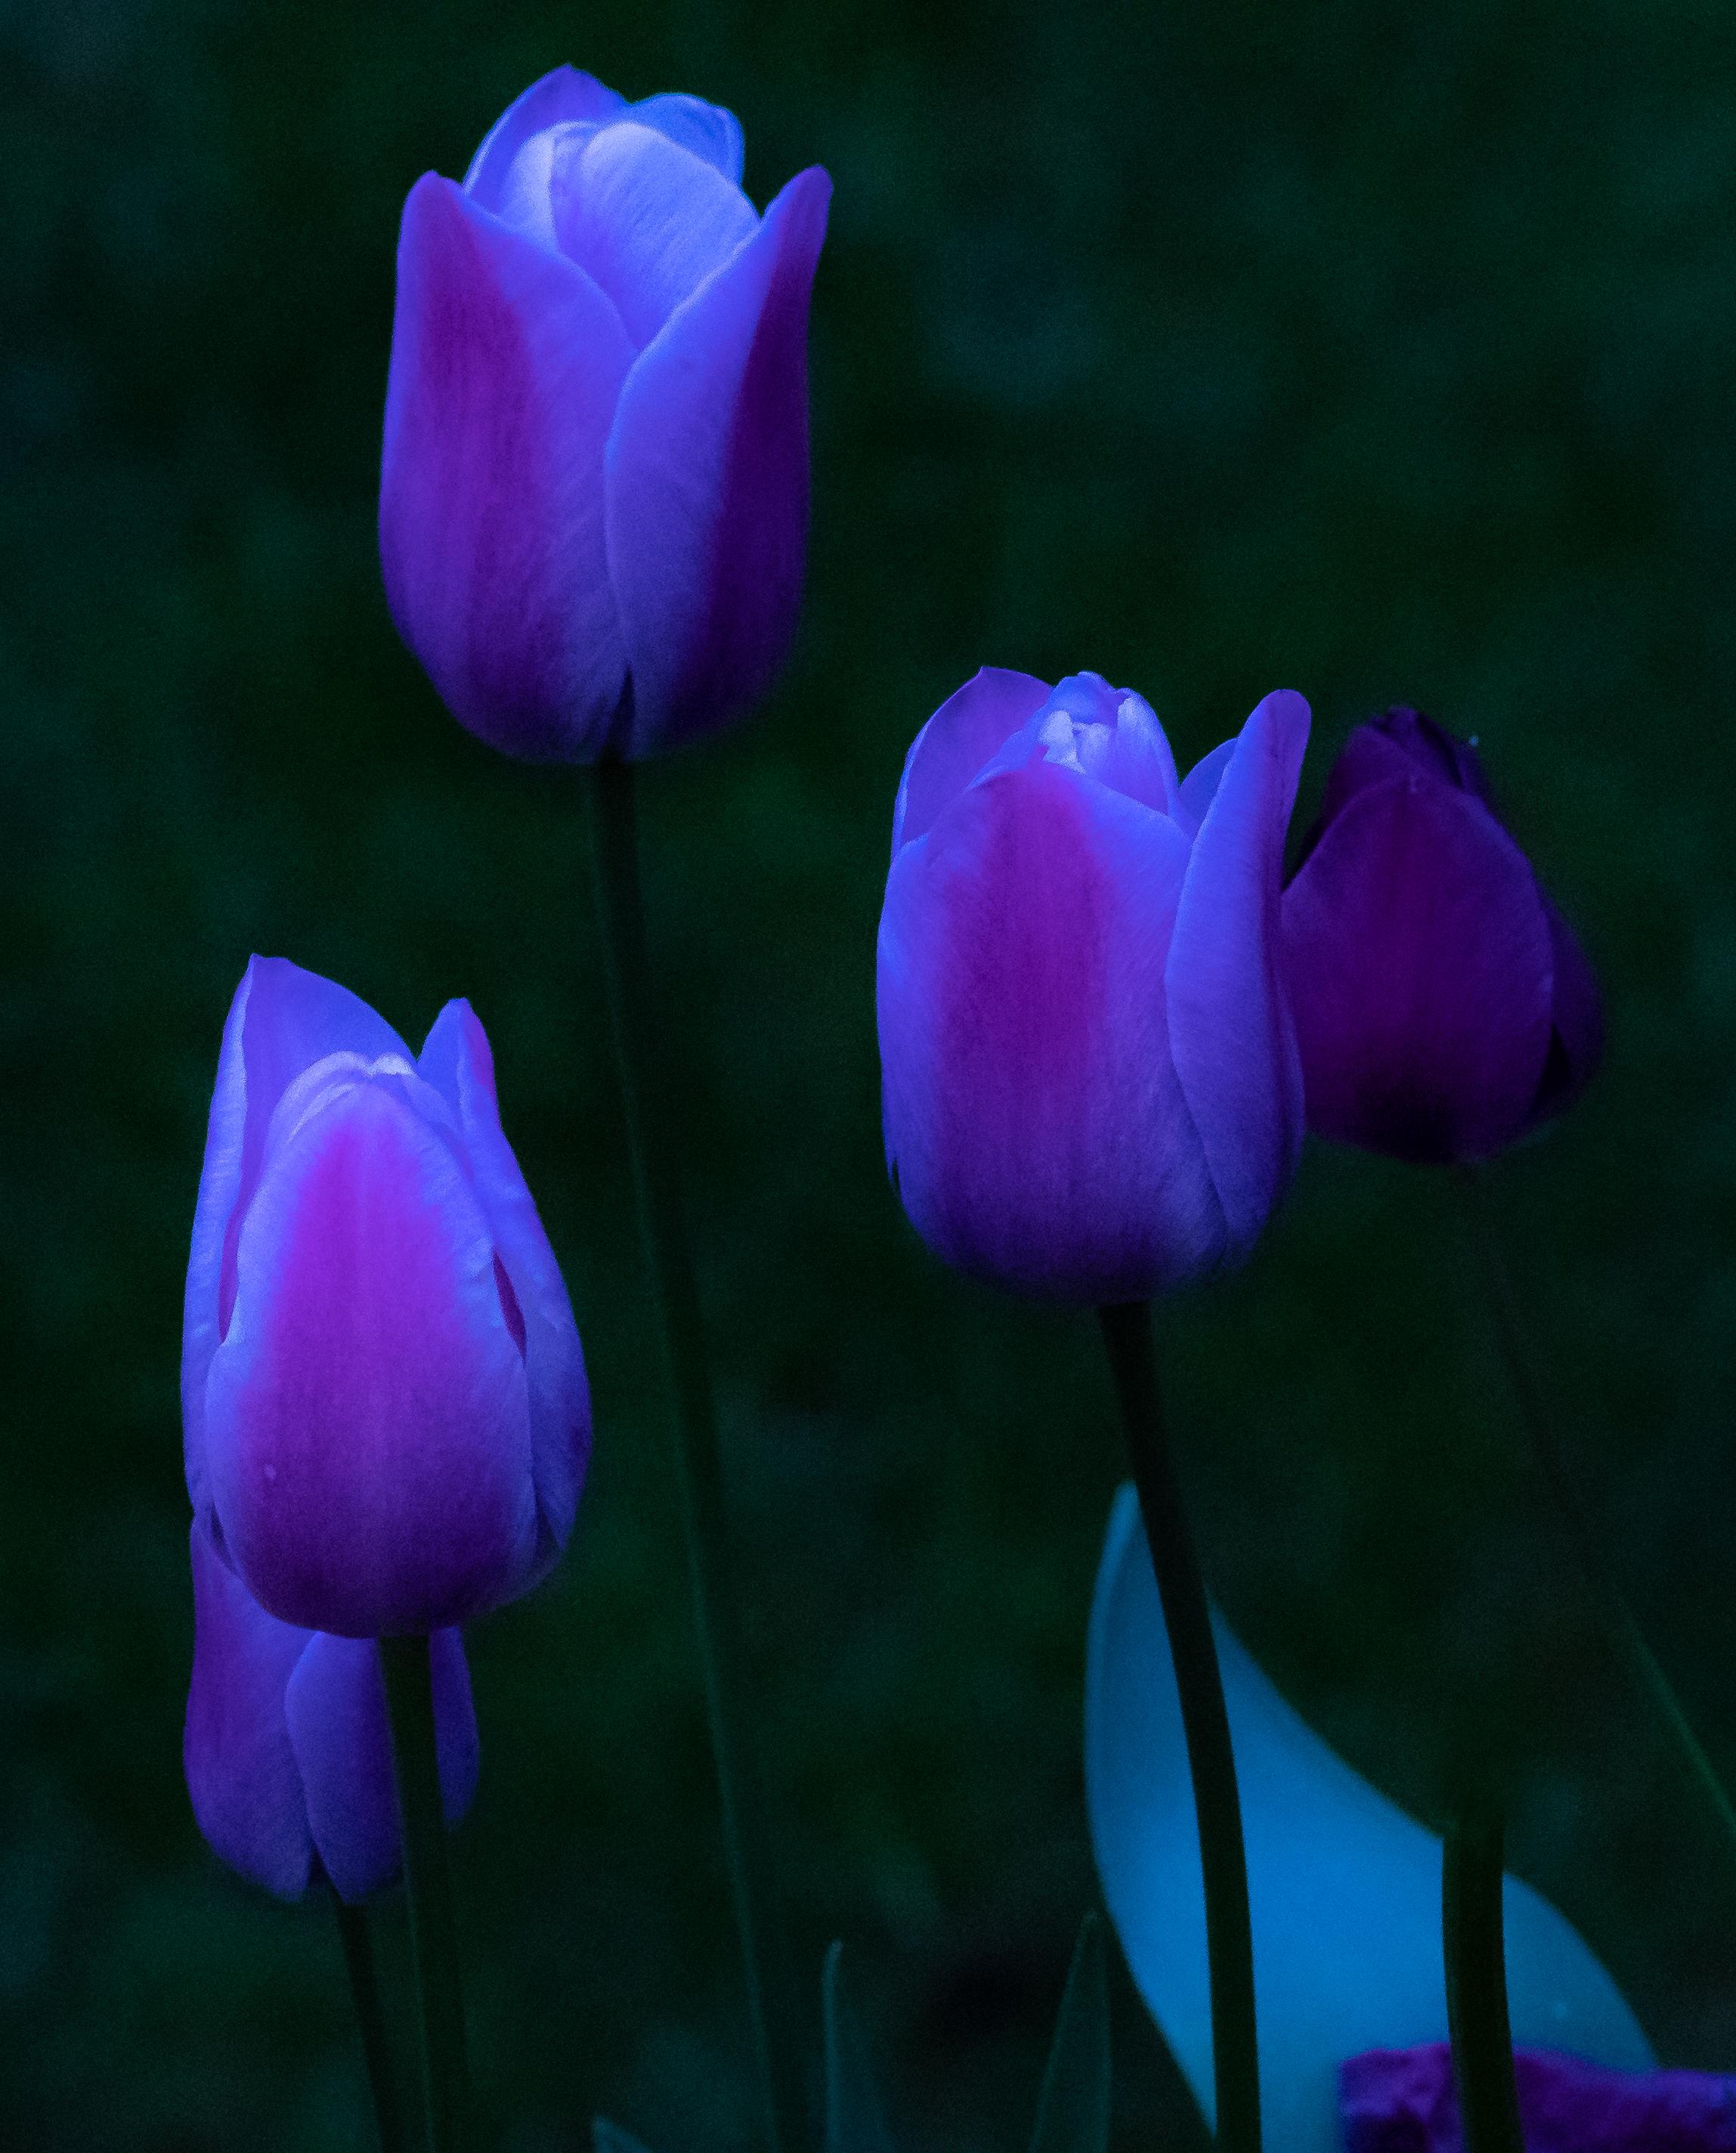 Tulips, PT, 2018